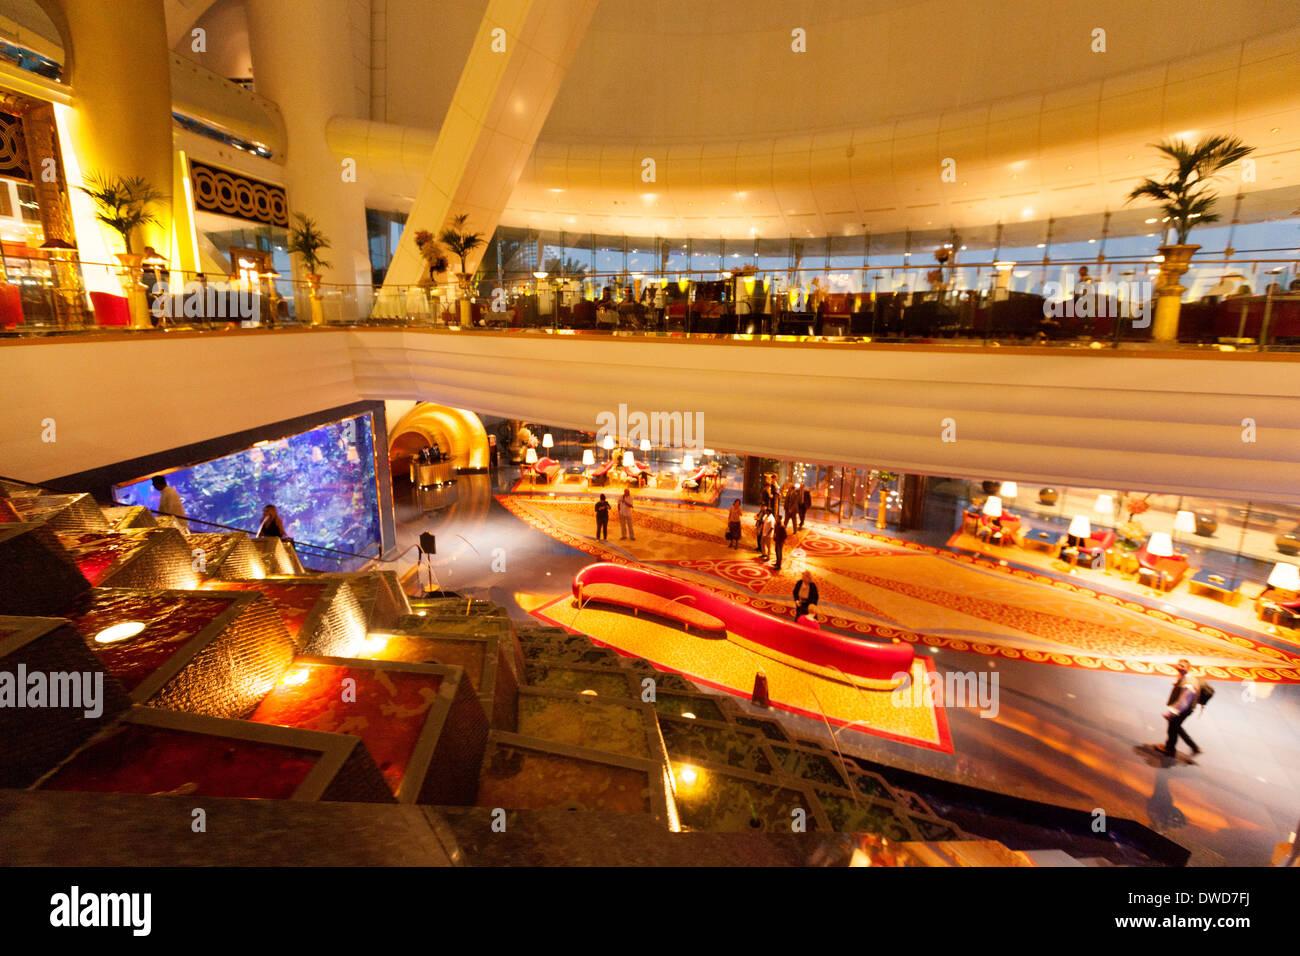 Burj al arab hotel interior ornate luxury in the foyer for Burj al arab hotel inside